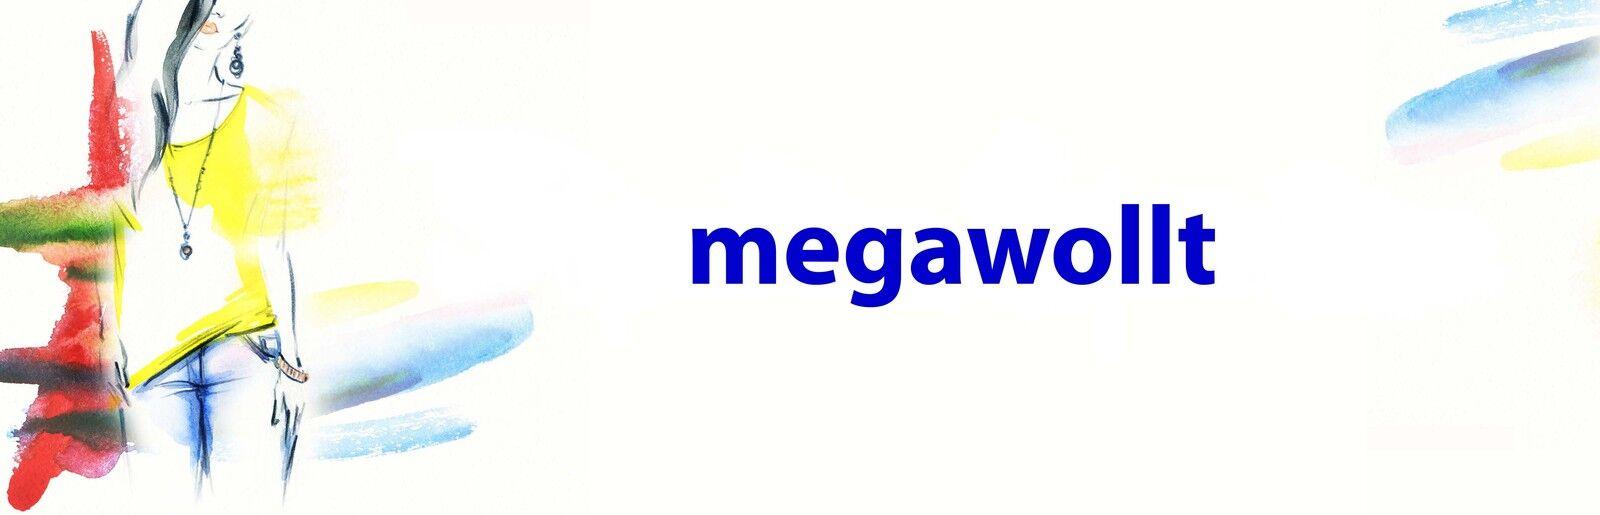 MEGAWOLLT